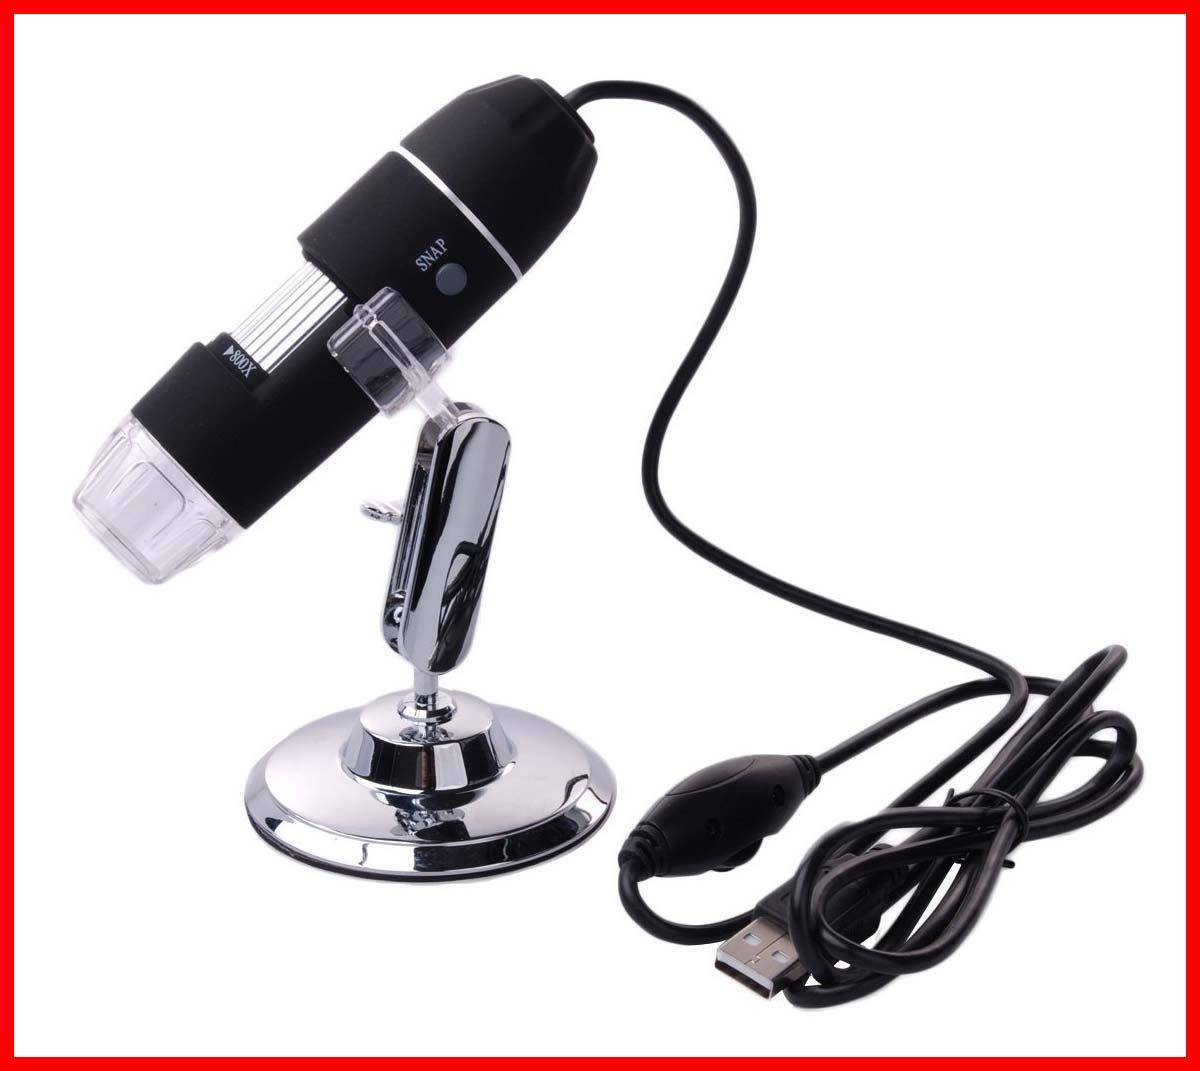 USB-Digital-Mikroskop Xcsource (1,3 MP, 100-200x)